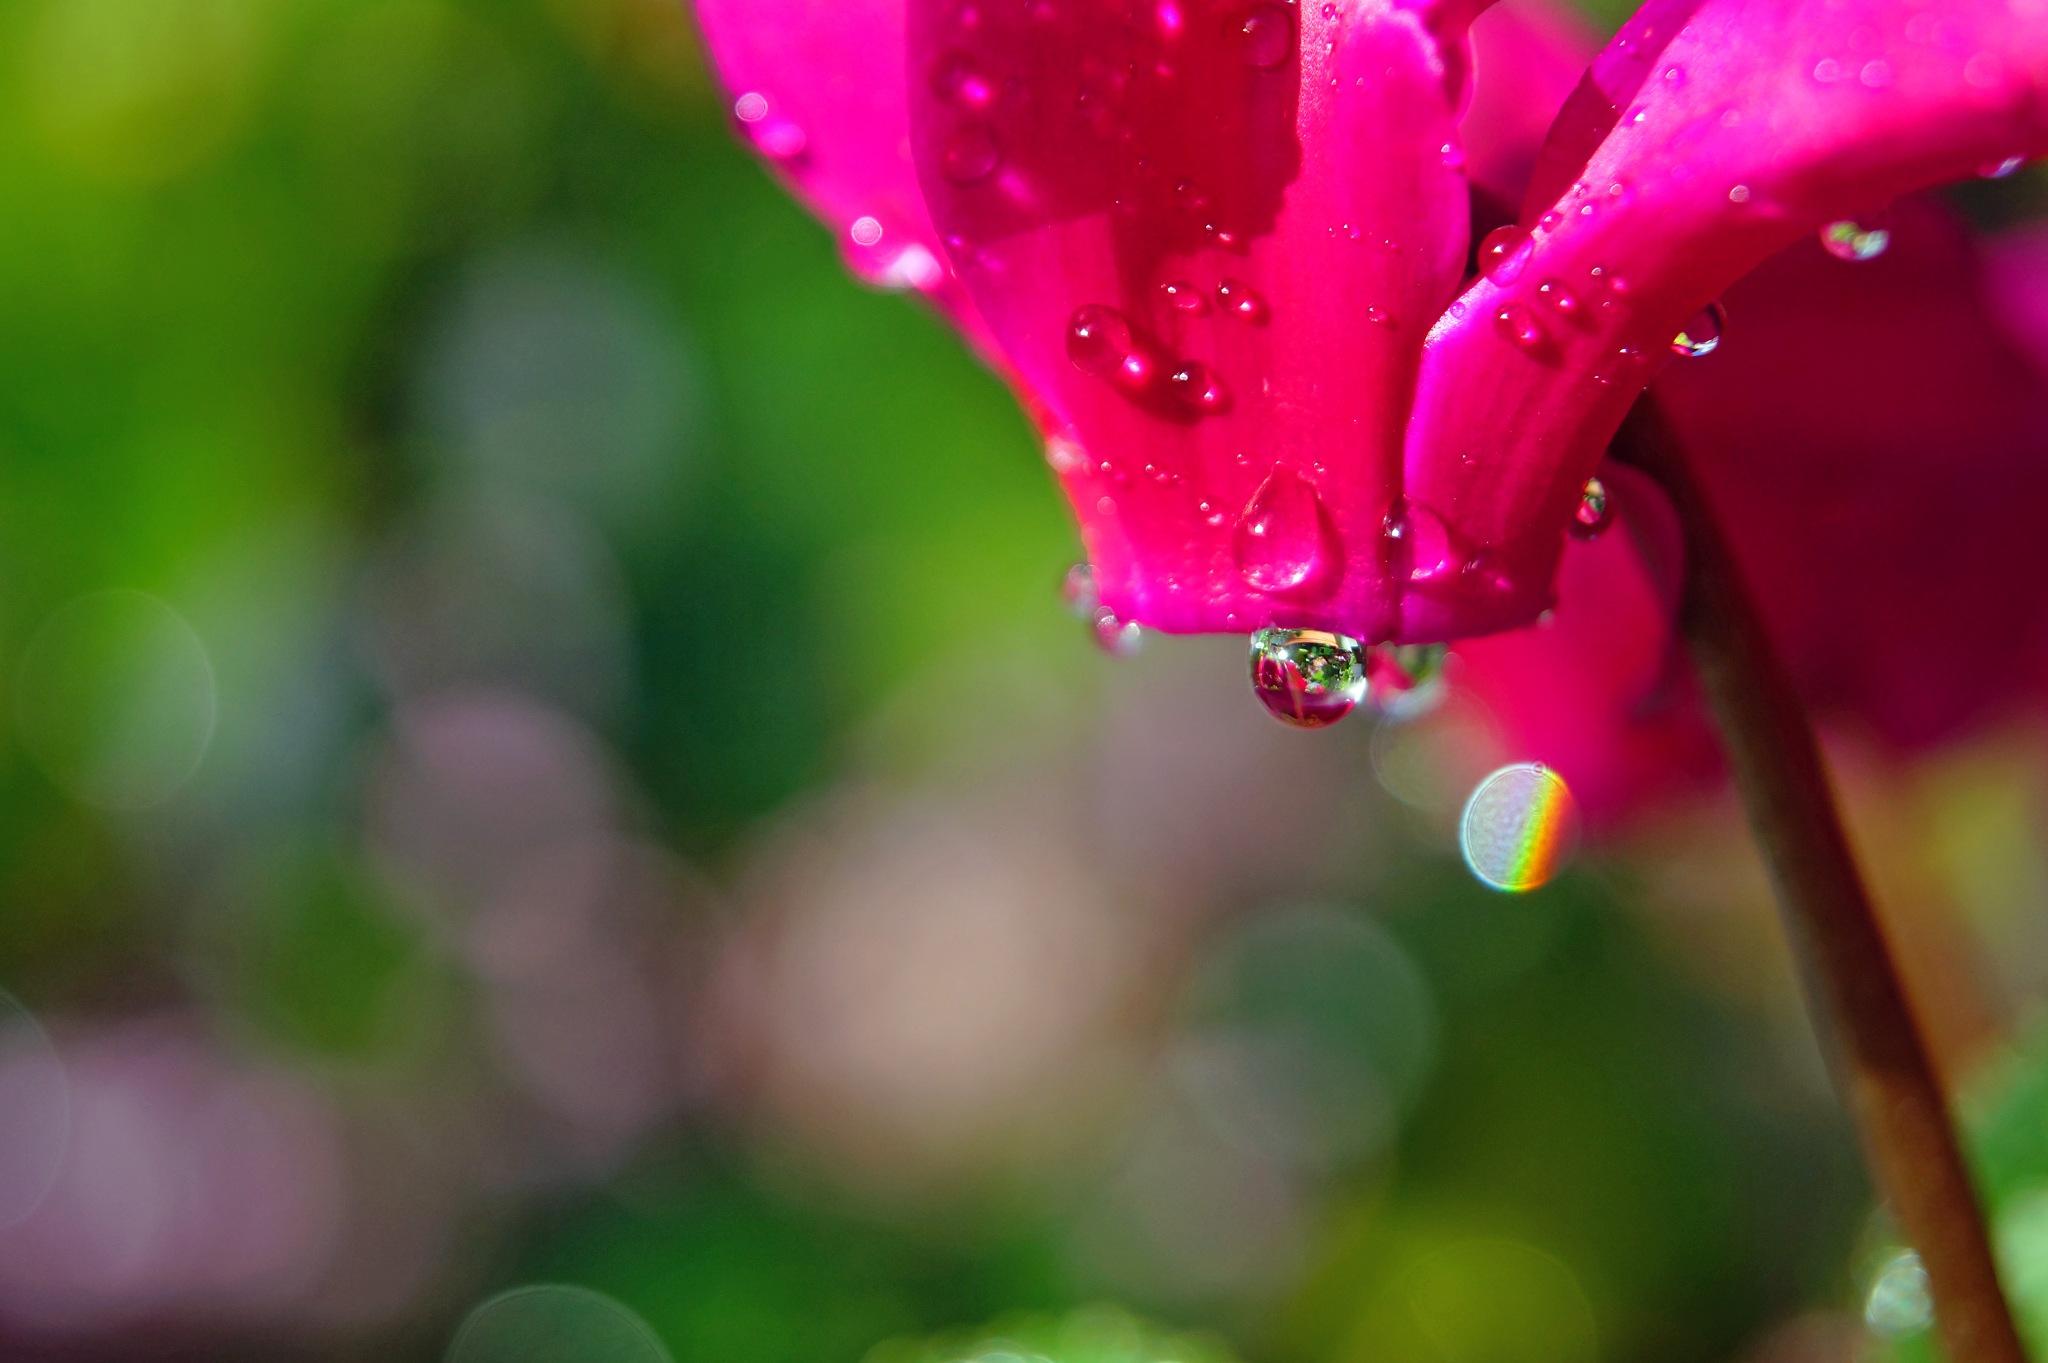 Cyclamen in the Rain by Marian Baay